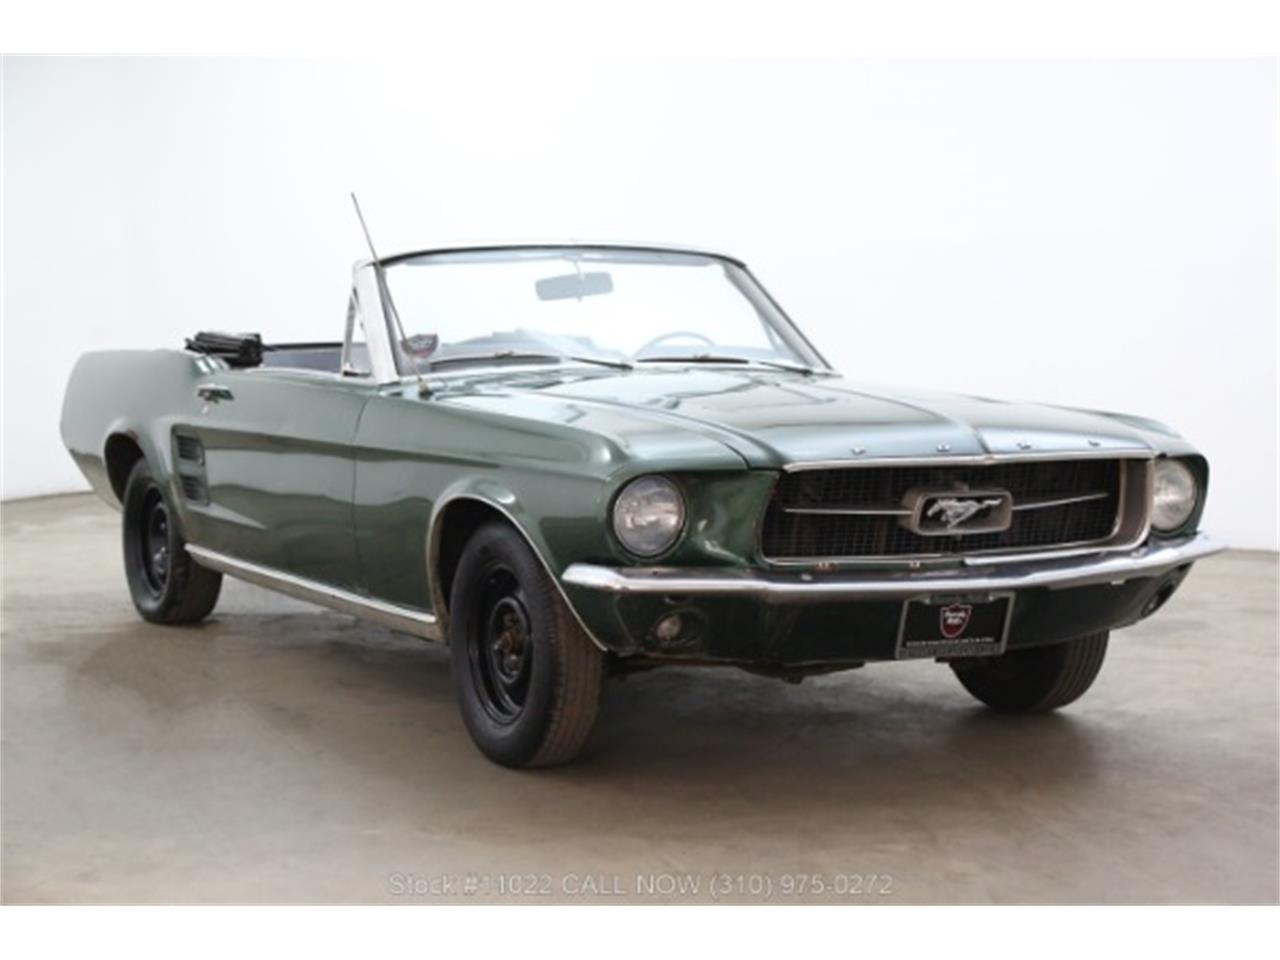 Ford Mustang 1967 prix tout compris 1967